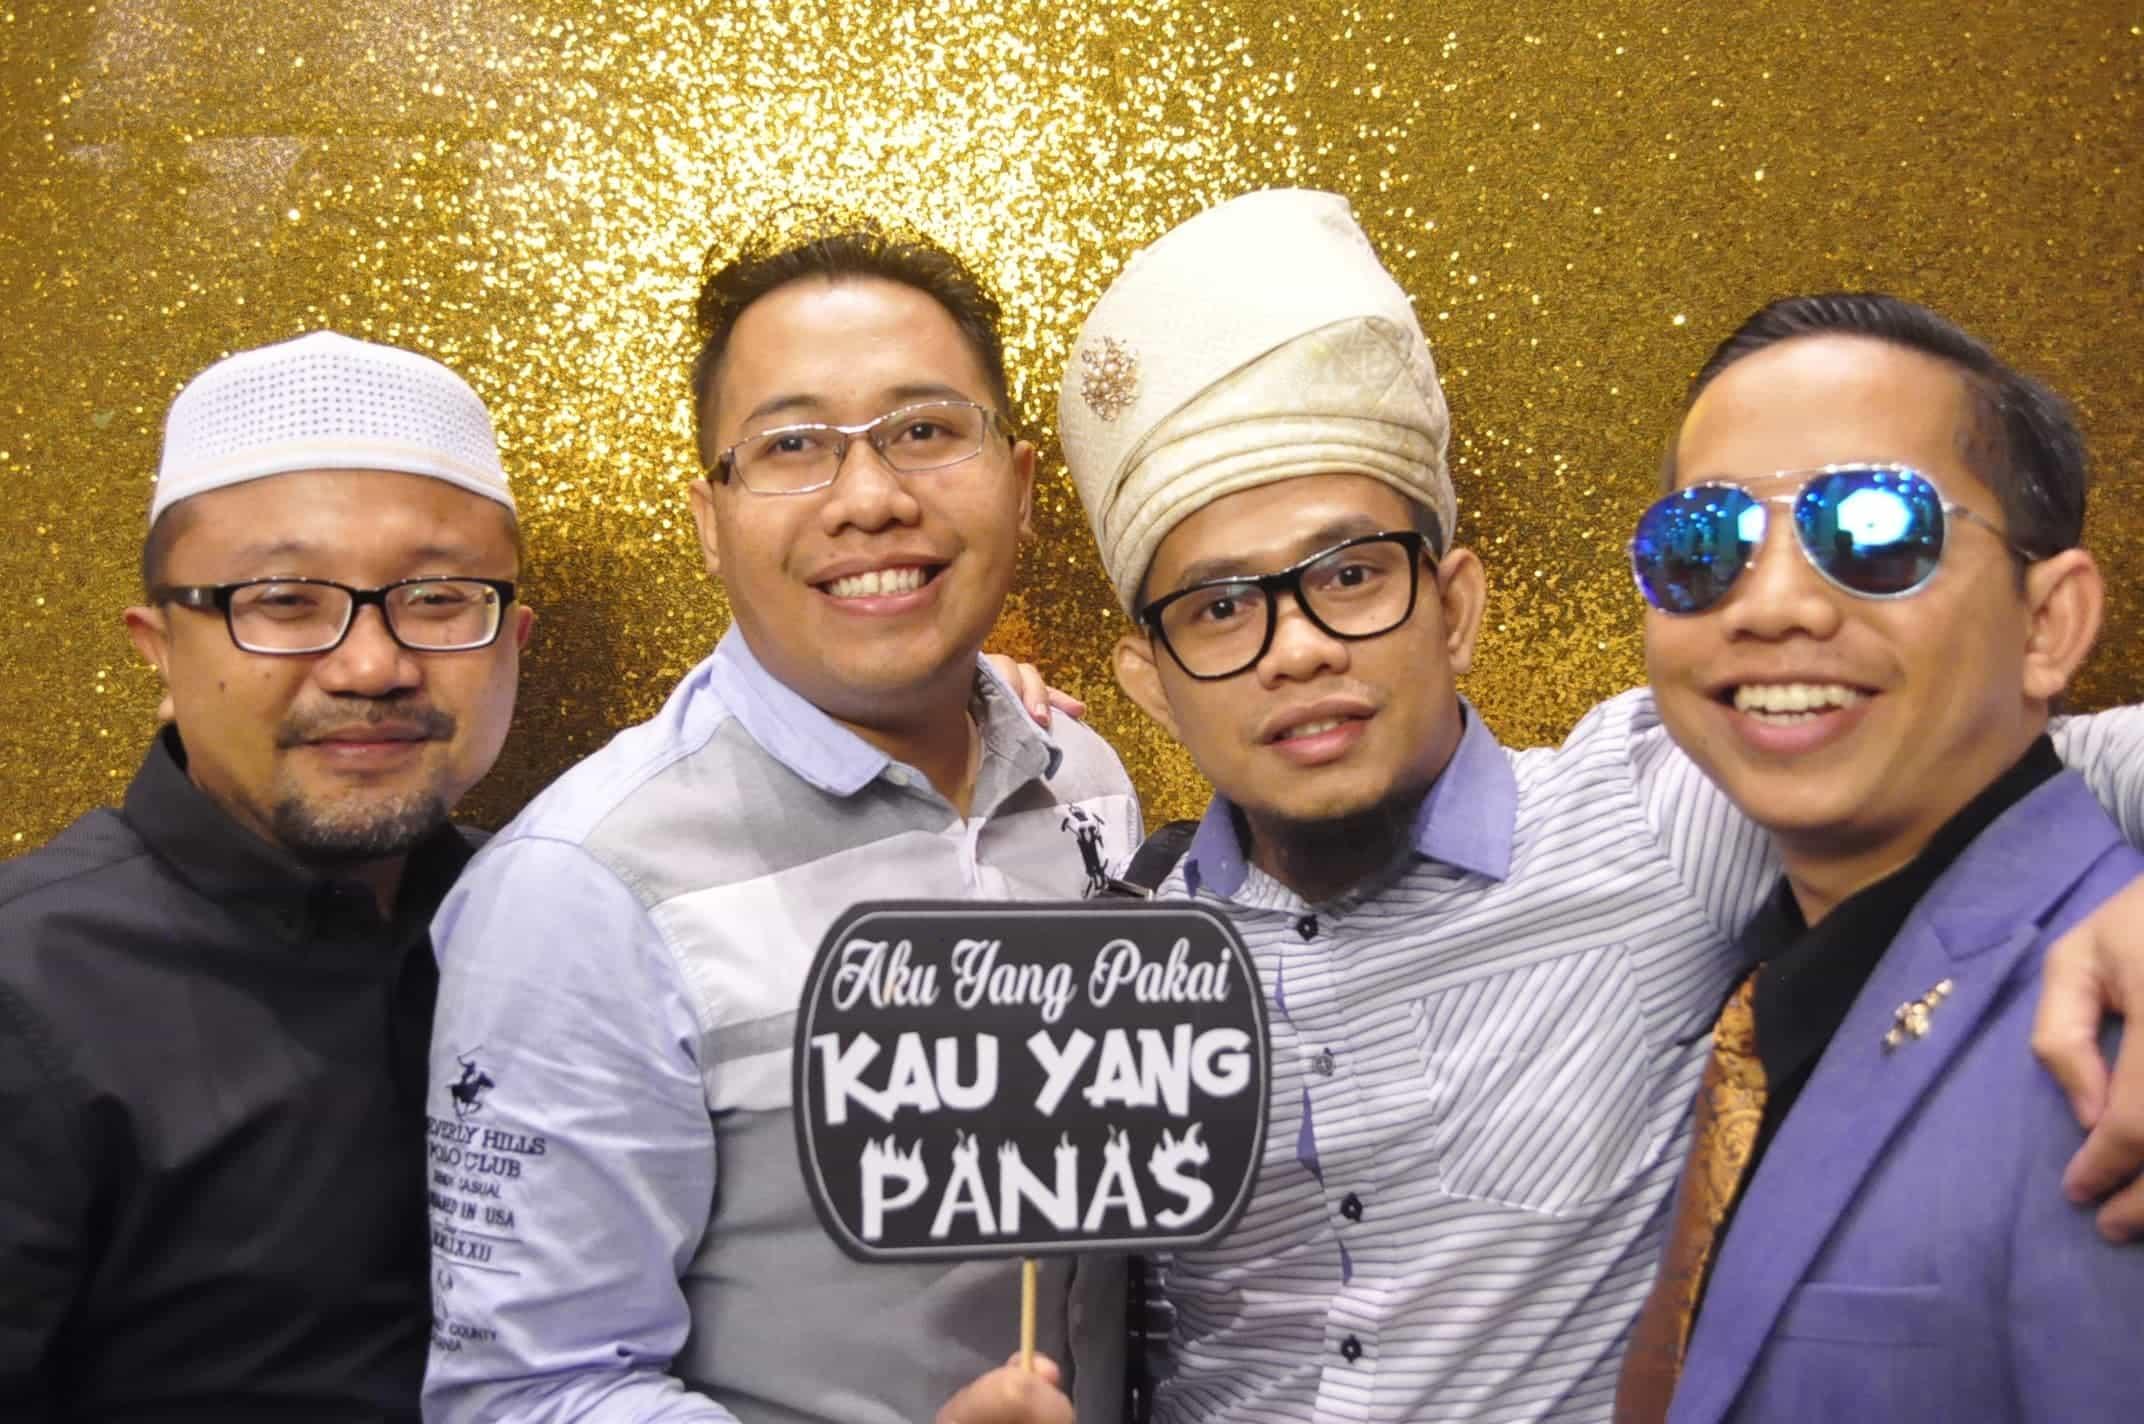 Malam Gala Anggun 2018 (Photobooth) 31